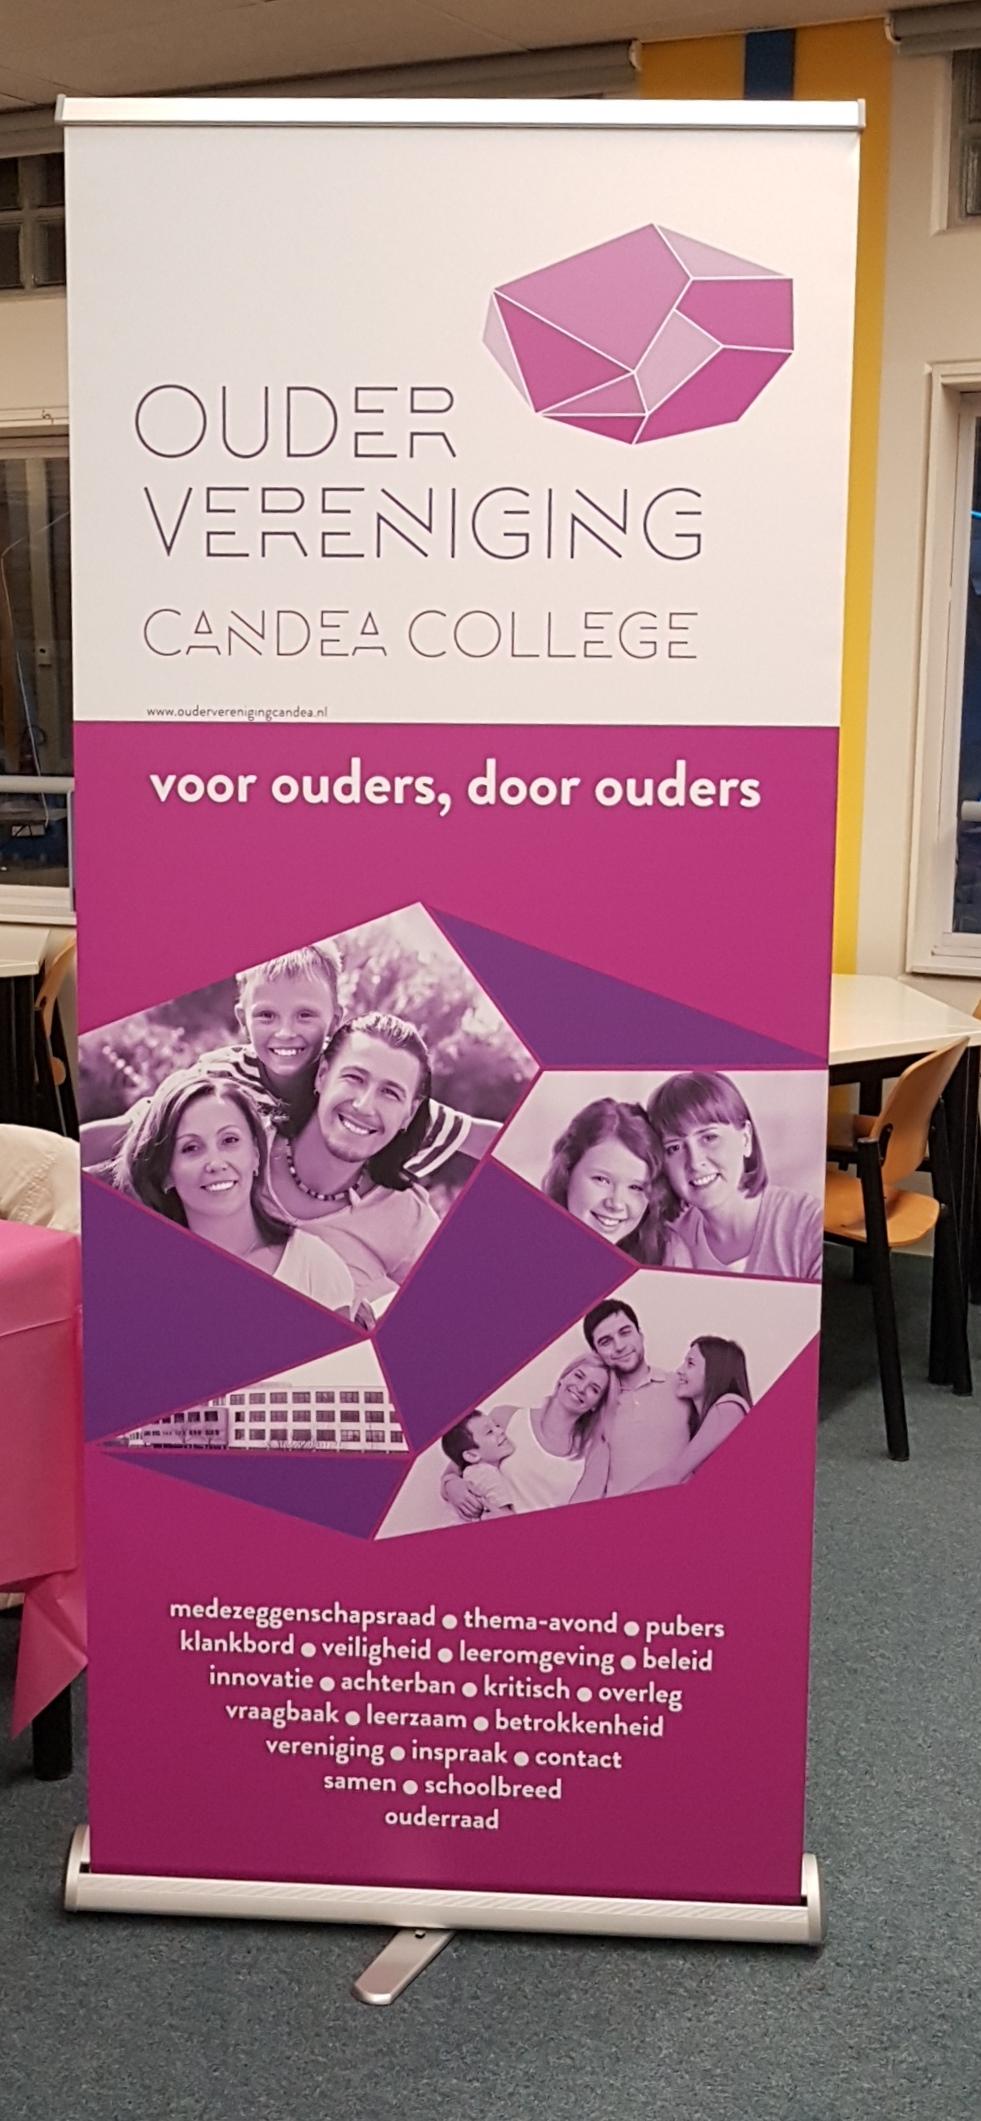 http://presentationmatters.nl/wp-content/uploads/2018/04/banier-als-foto-1.jpg